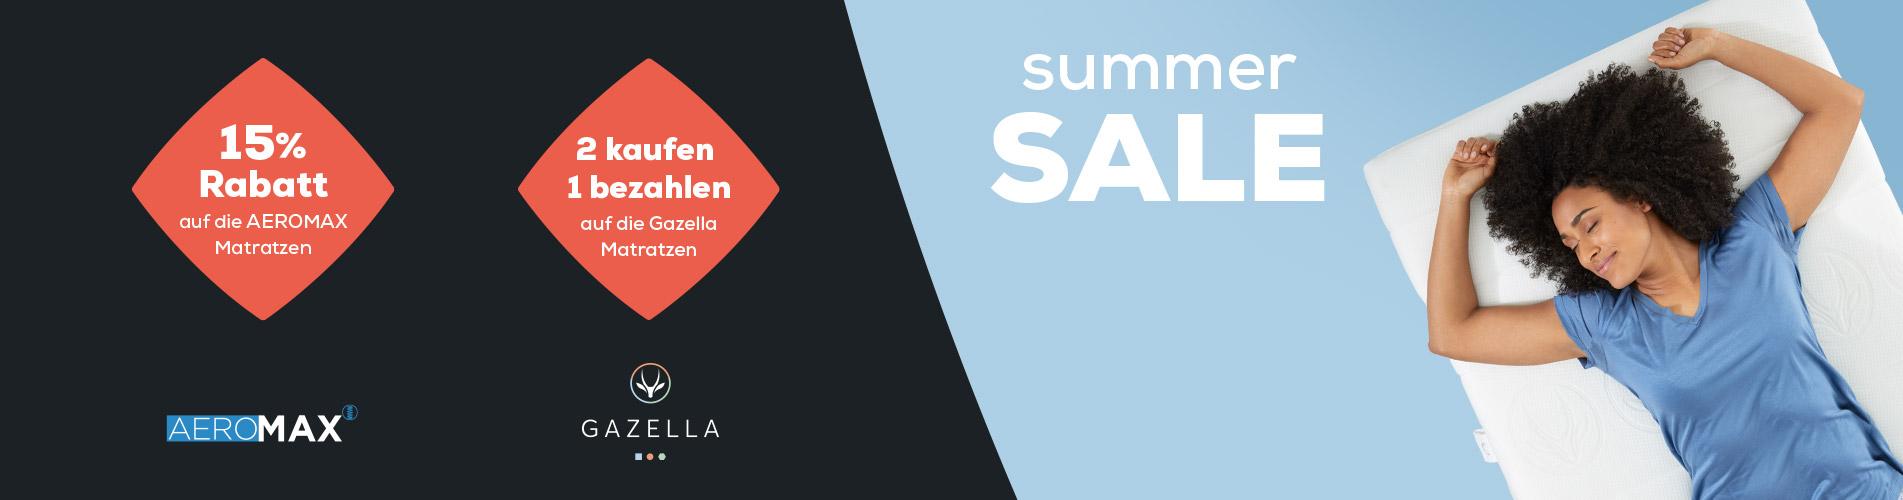 Matratzen kollektion - Summer Sale | Swiss Sense